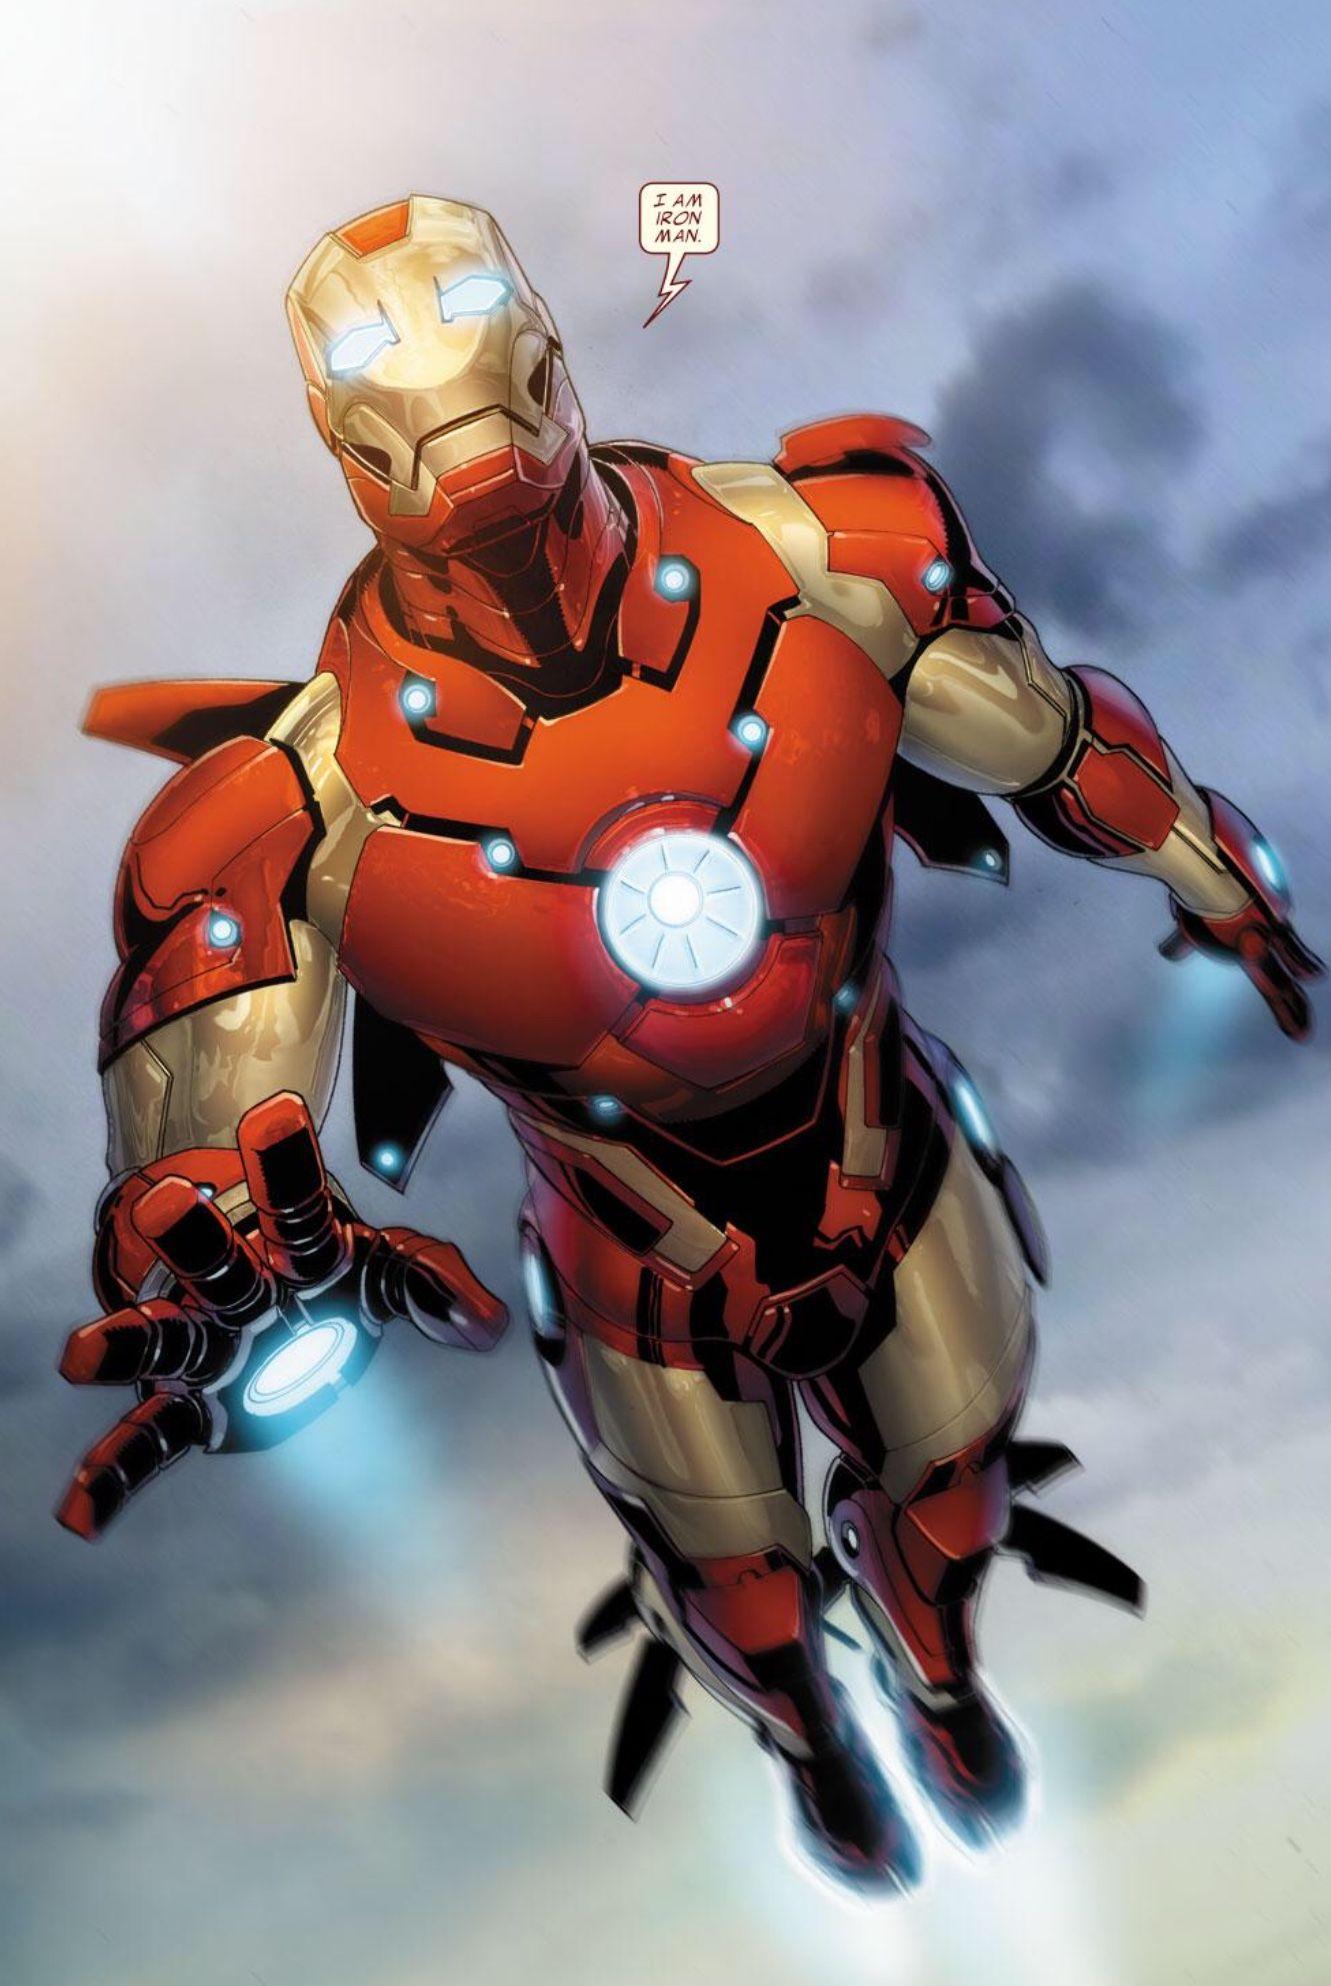 File:Ironman02.jpg